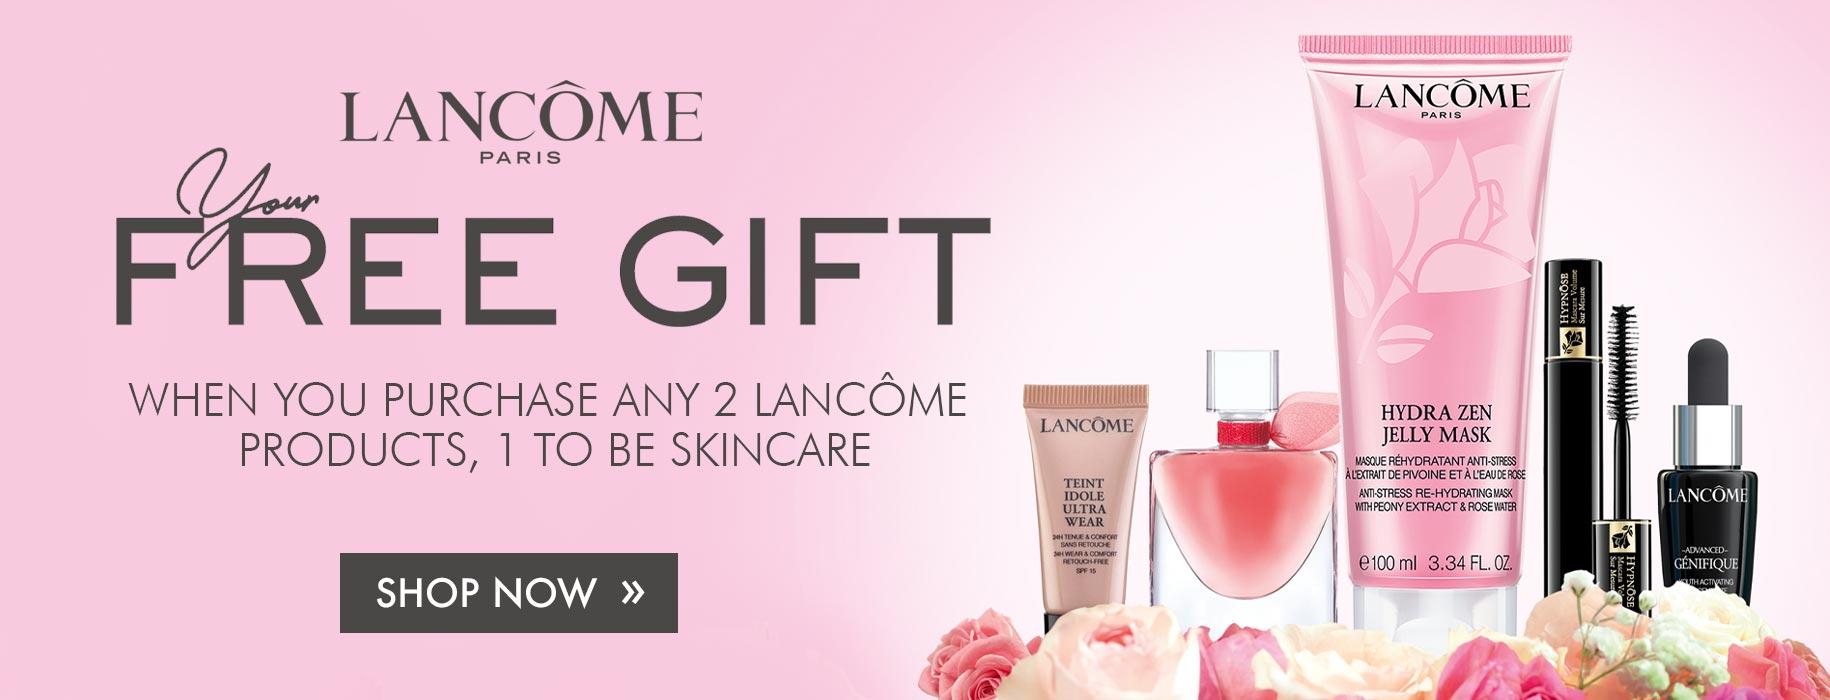 Lancome Free Gift!